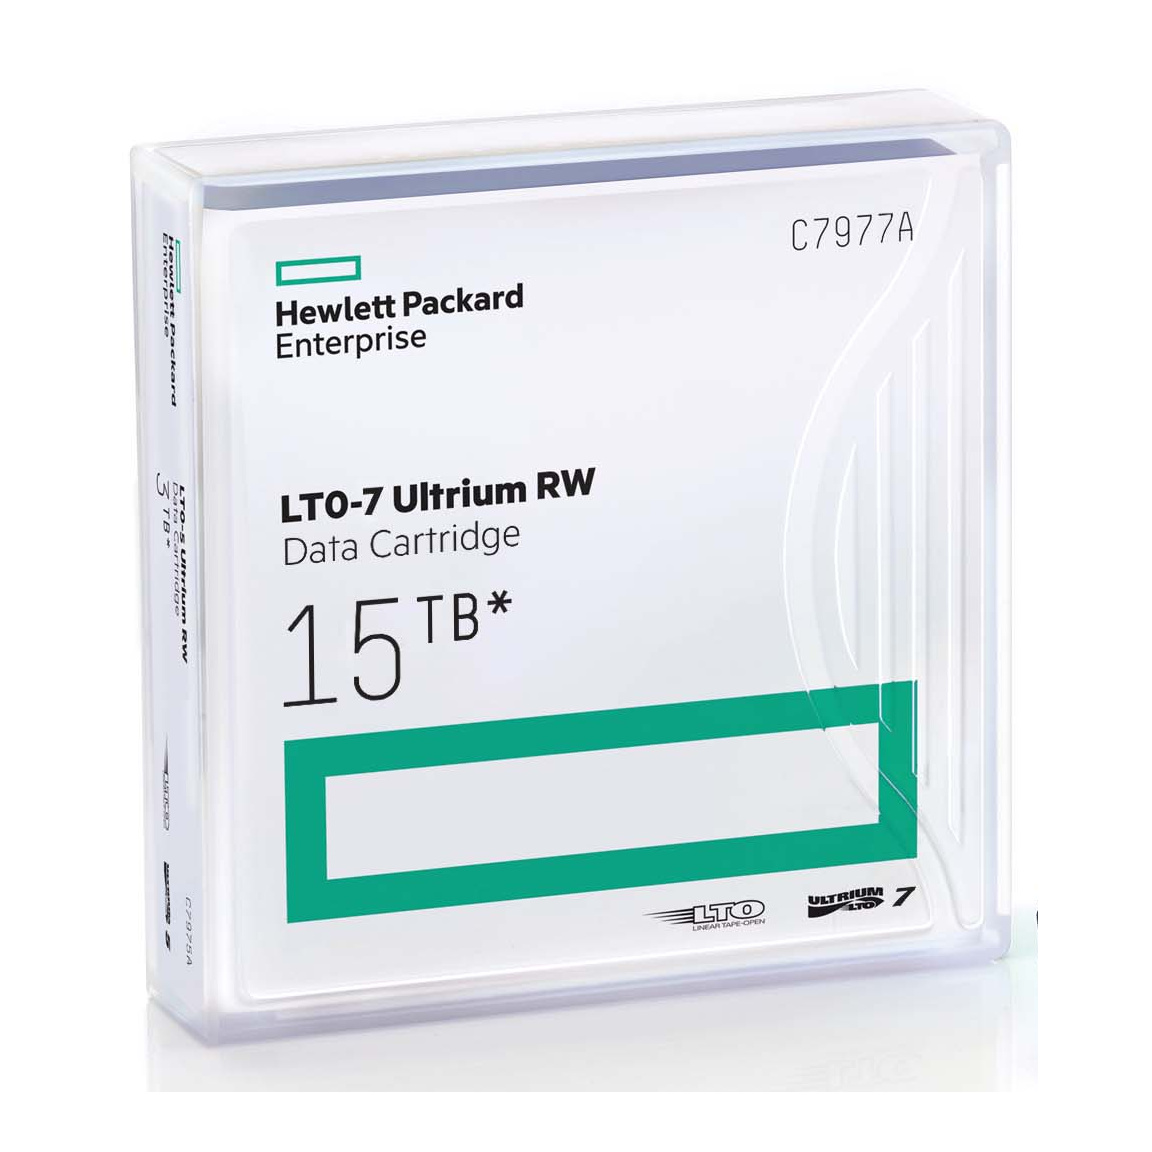 HPE LTO 7 Tape with Barium Ferrite (BaFe) C7977A